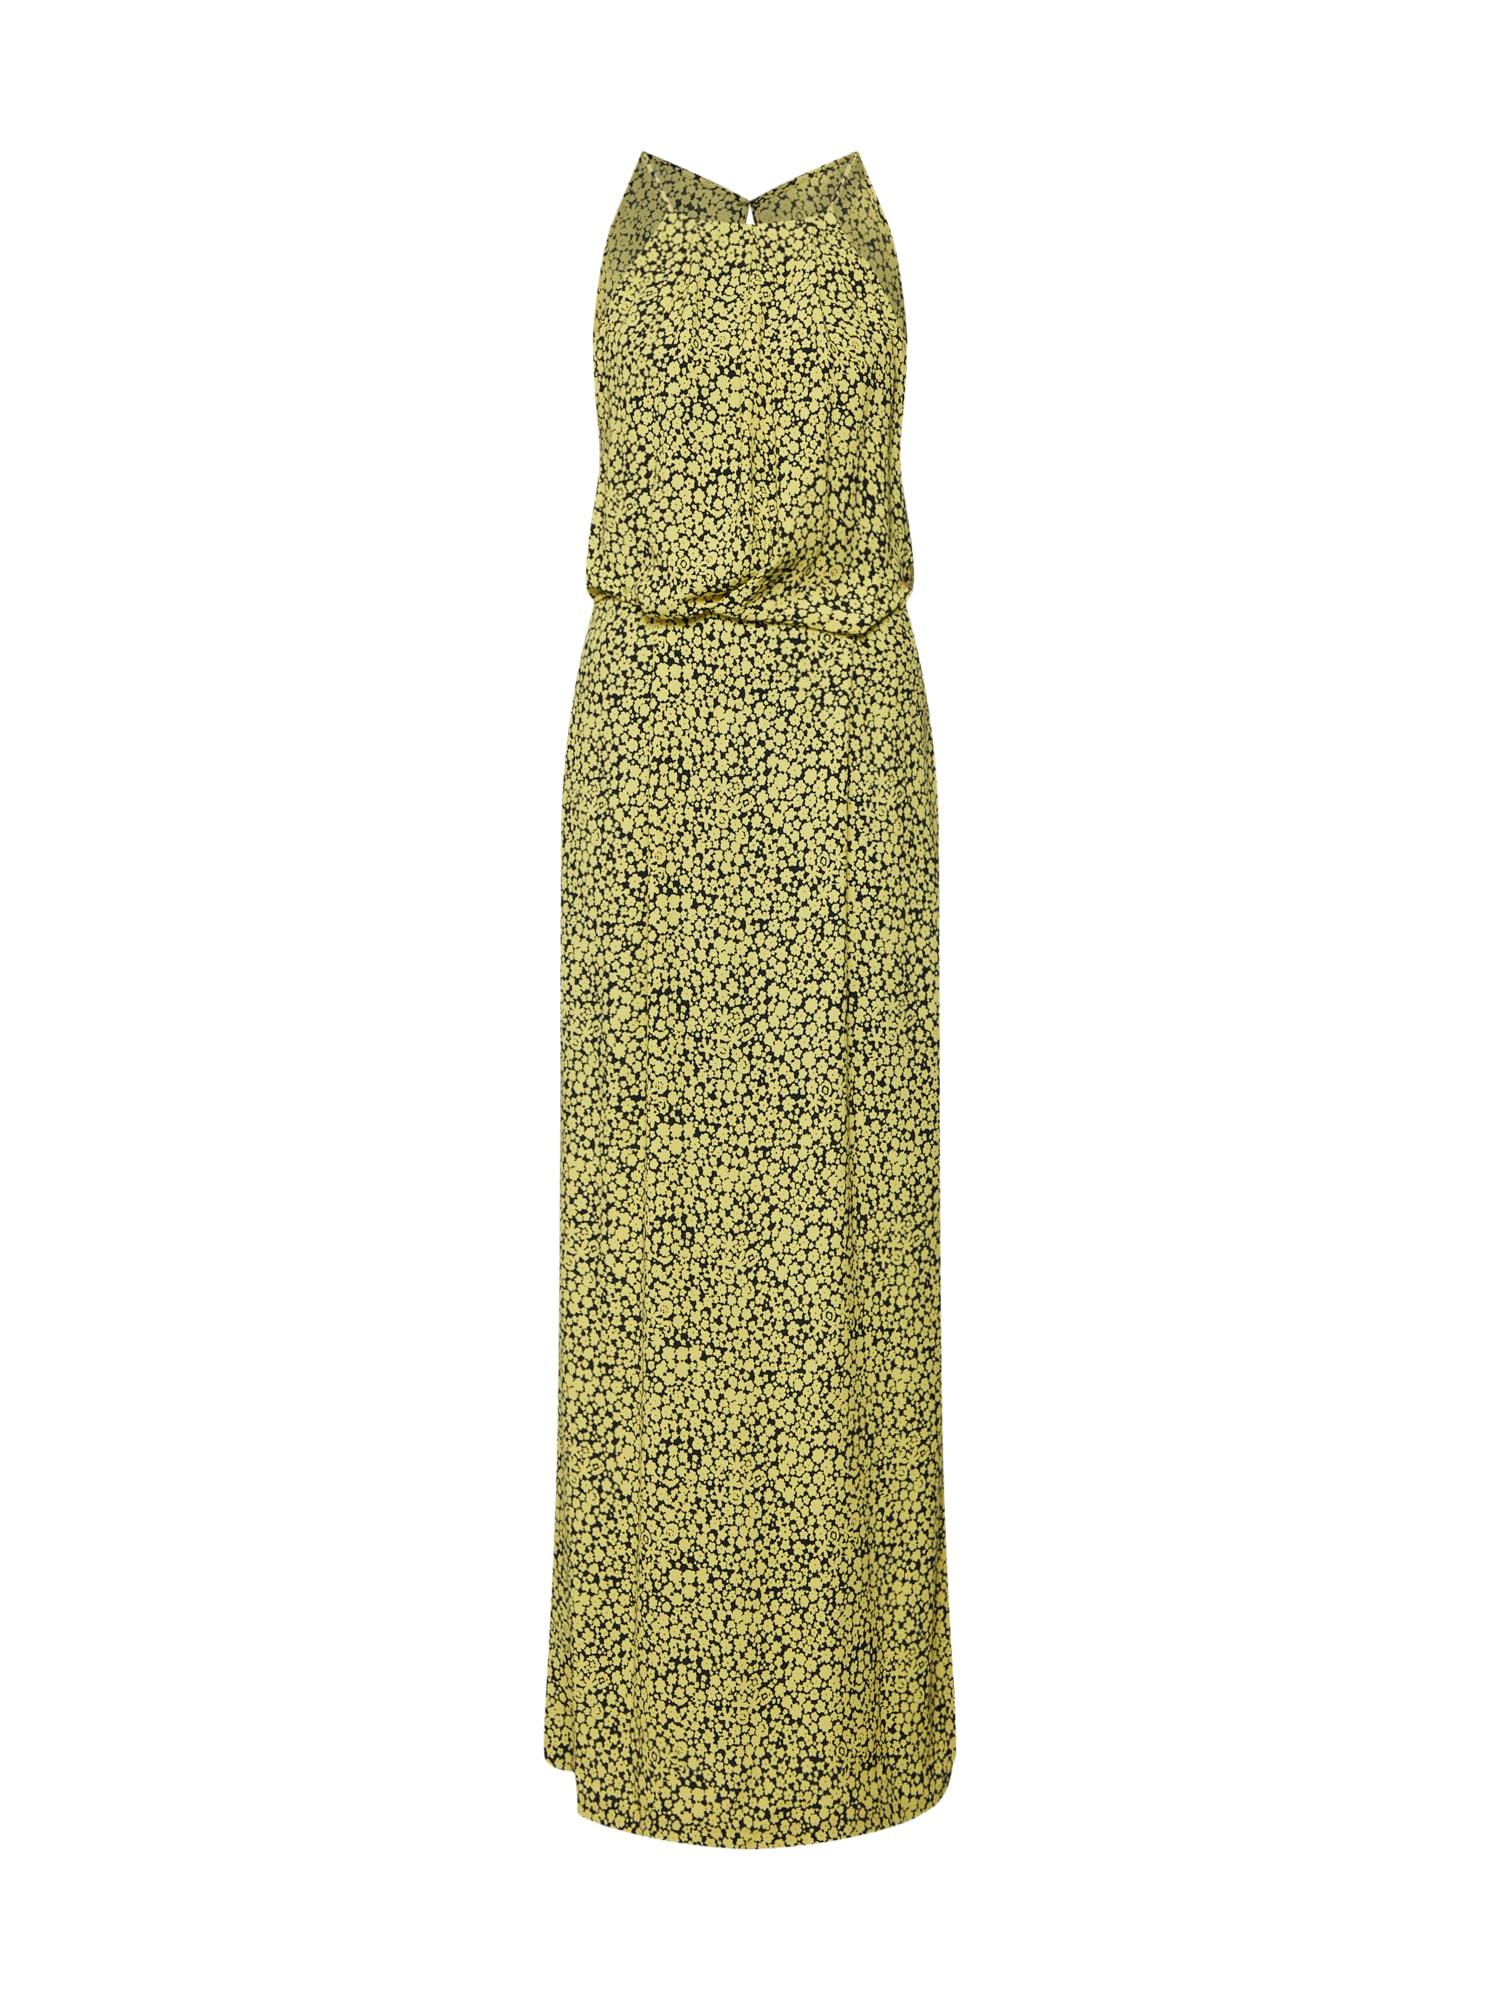 Letní šaty Willow nl l dress aop 5687 žlutá Samsoe & Samsoe